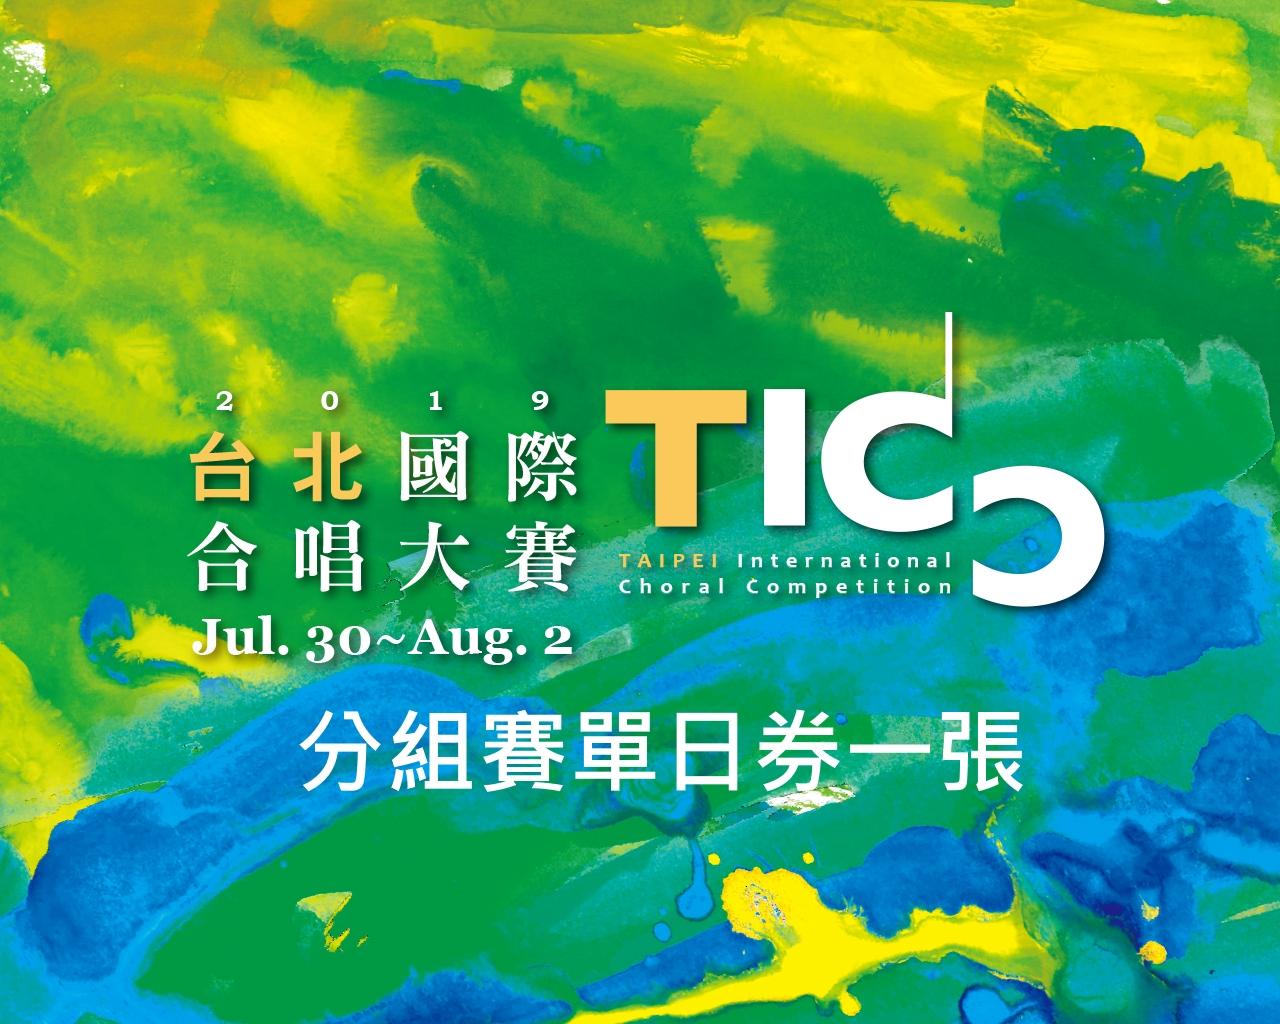 TICC19 TICF19 banner(1280x1024).jpg